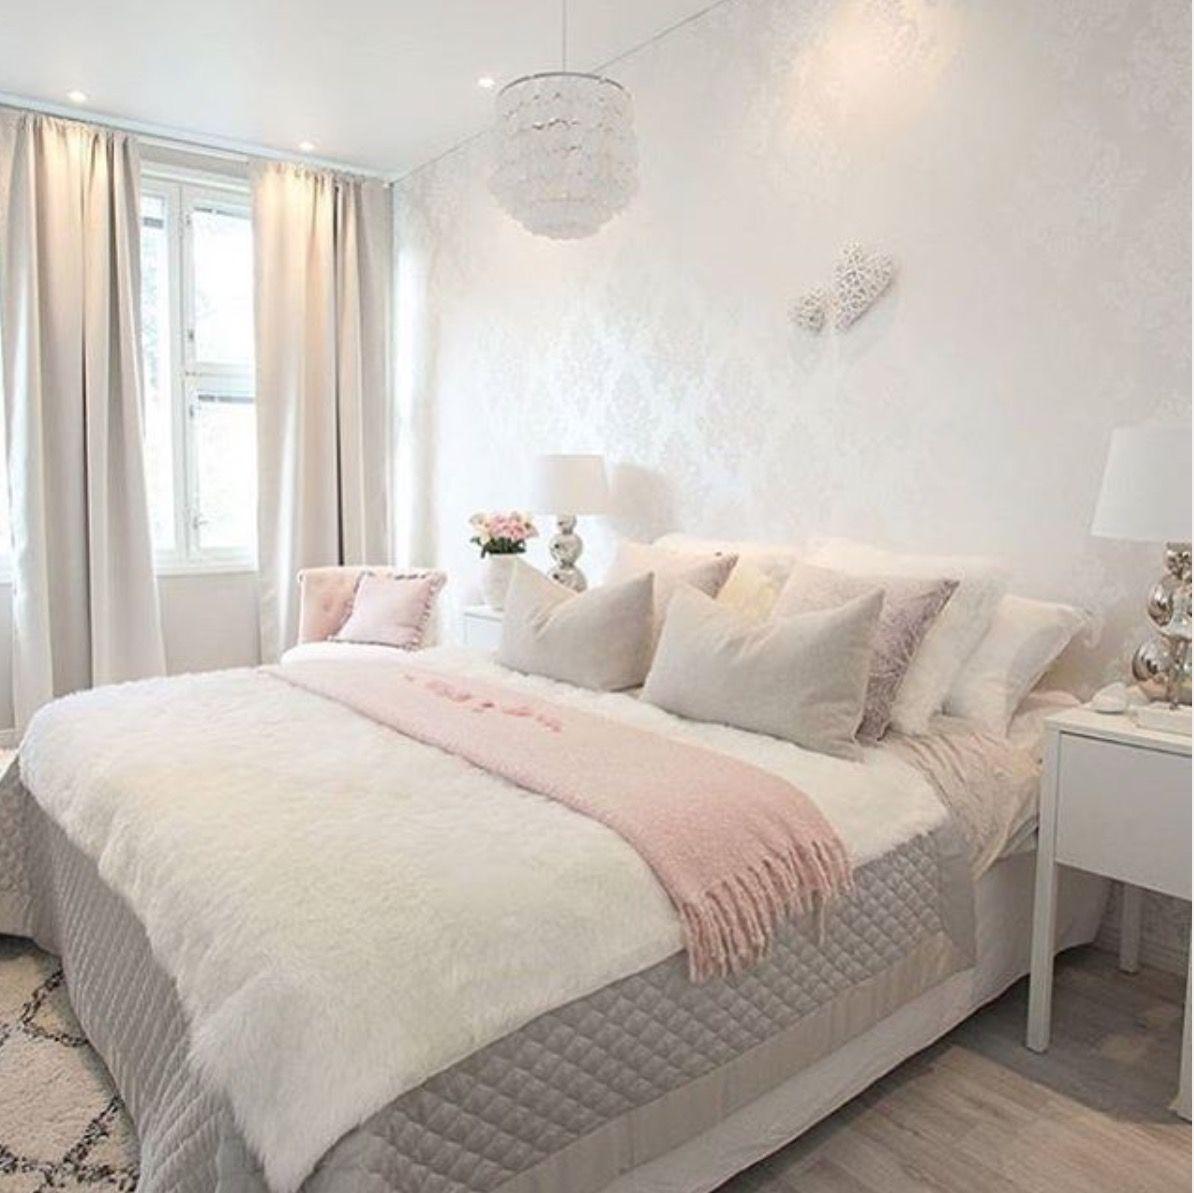 Pin de Camelia Cami en cute Pinterest Dormitorio de chicas